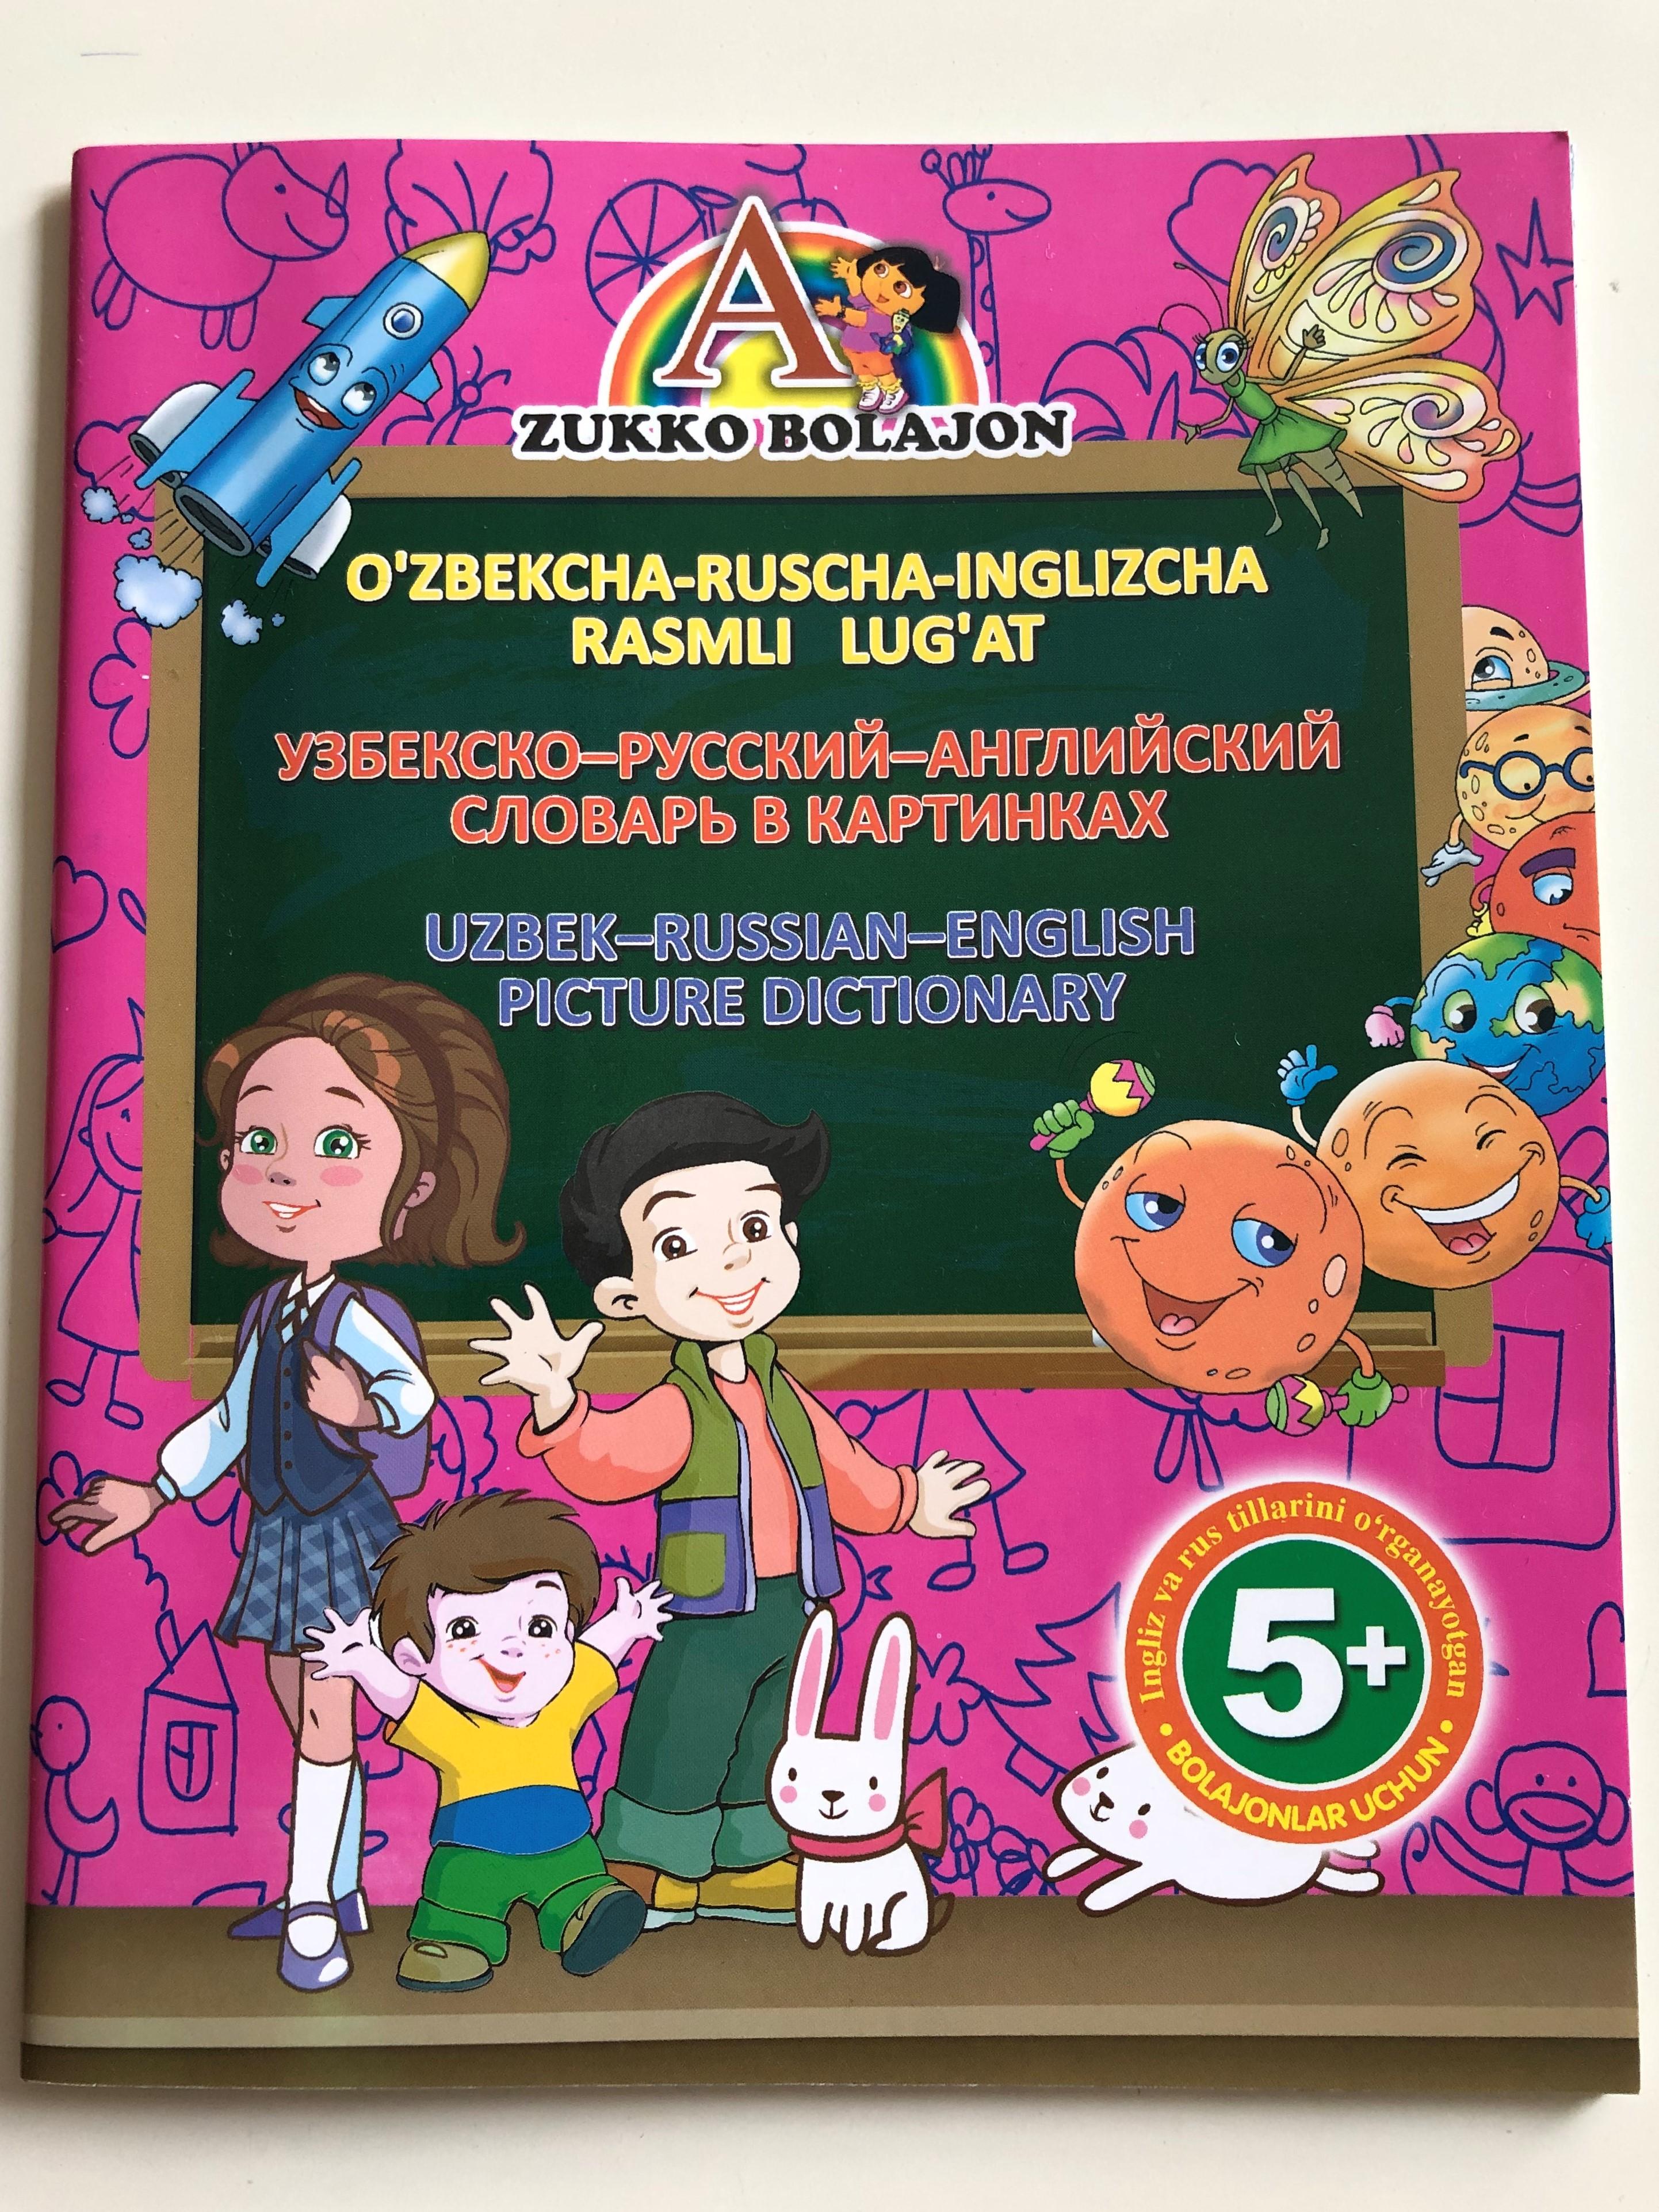 uzbek-russian-english-picture-dictionary-by-zukko-bolajon-o-zbekcha-ruscha-inglizcha-rasmli-lug-at-paperback-2016-1-.jpg